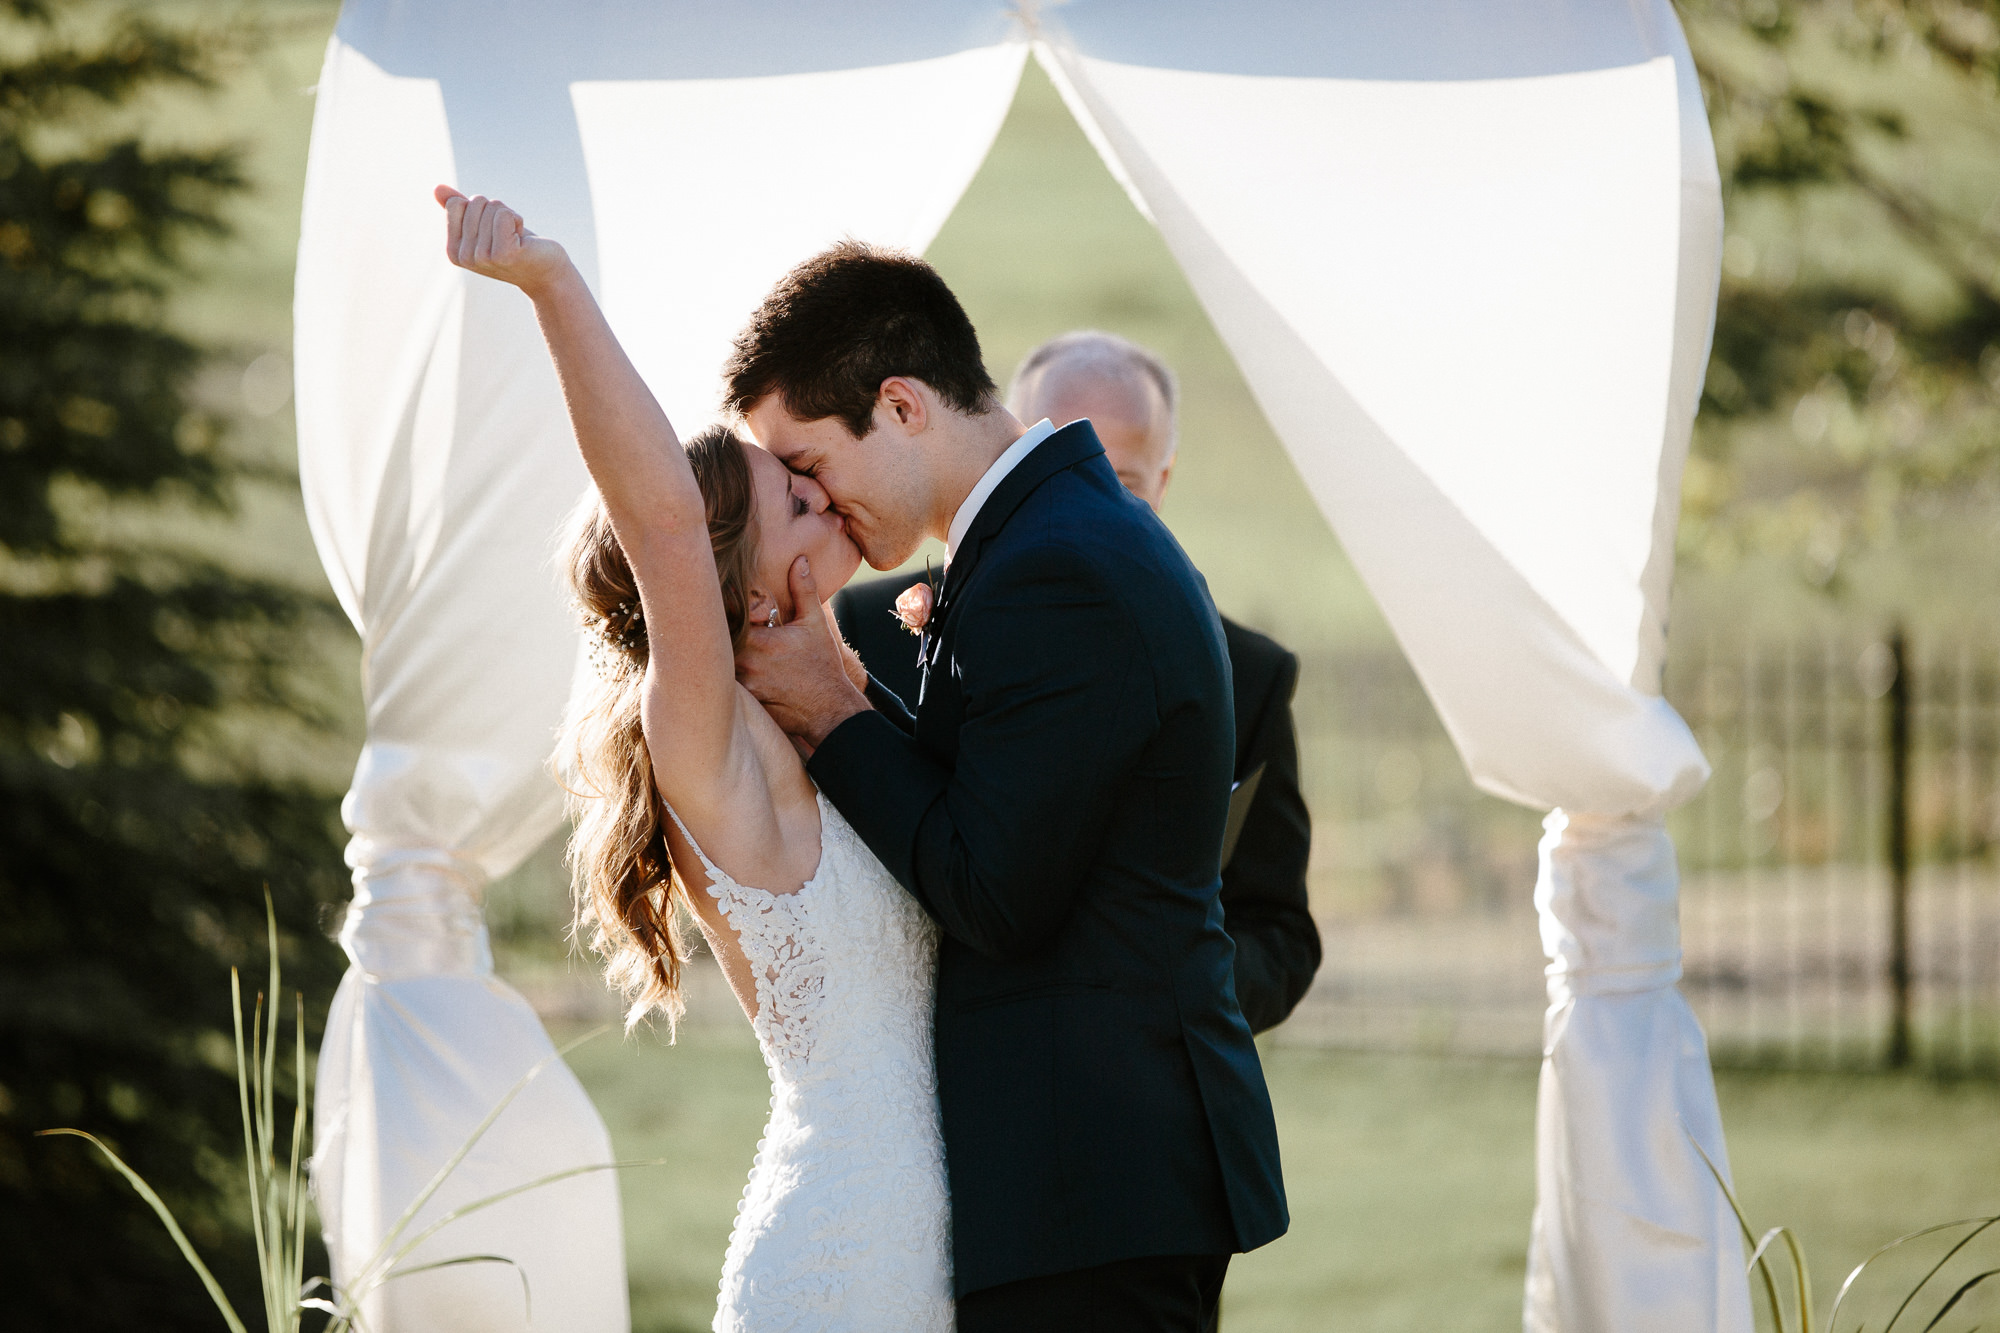 wedding-elopement-adventerous-romantic-timeless-south-dakota-blue-haven-barn-054.jpg